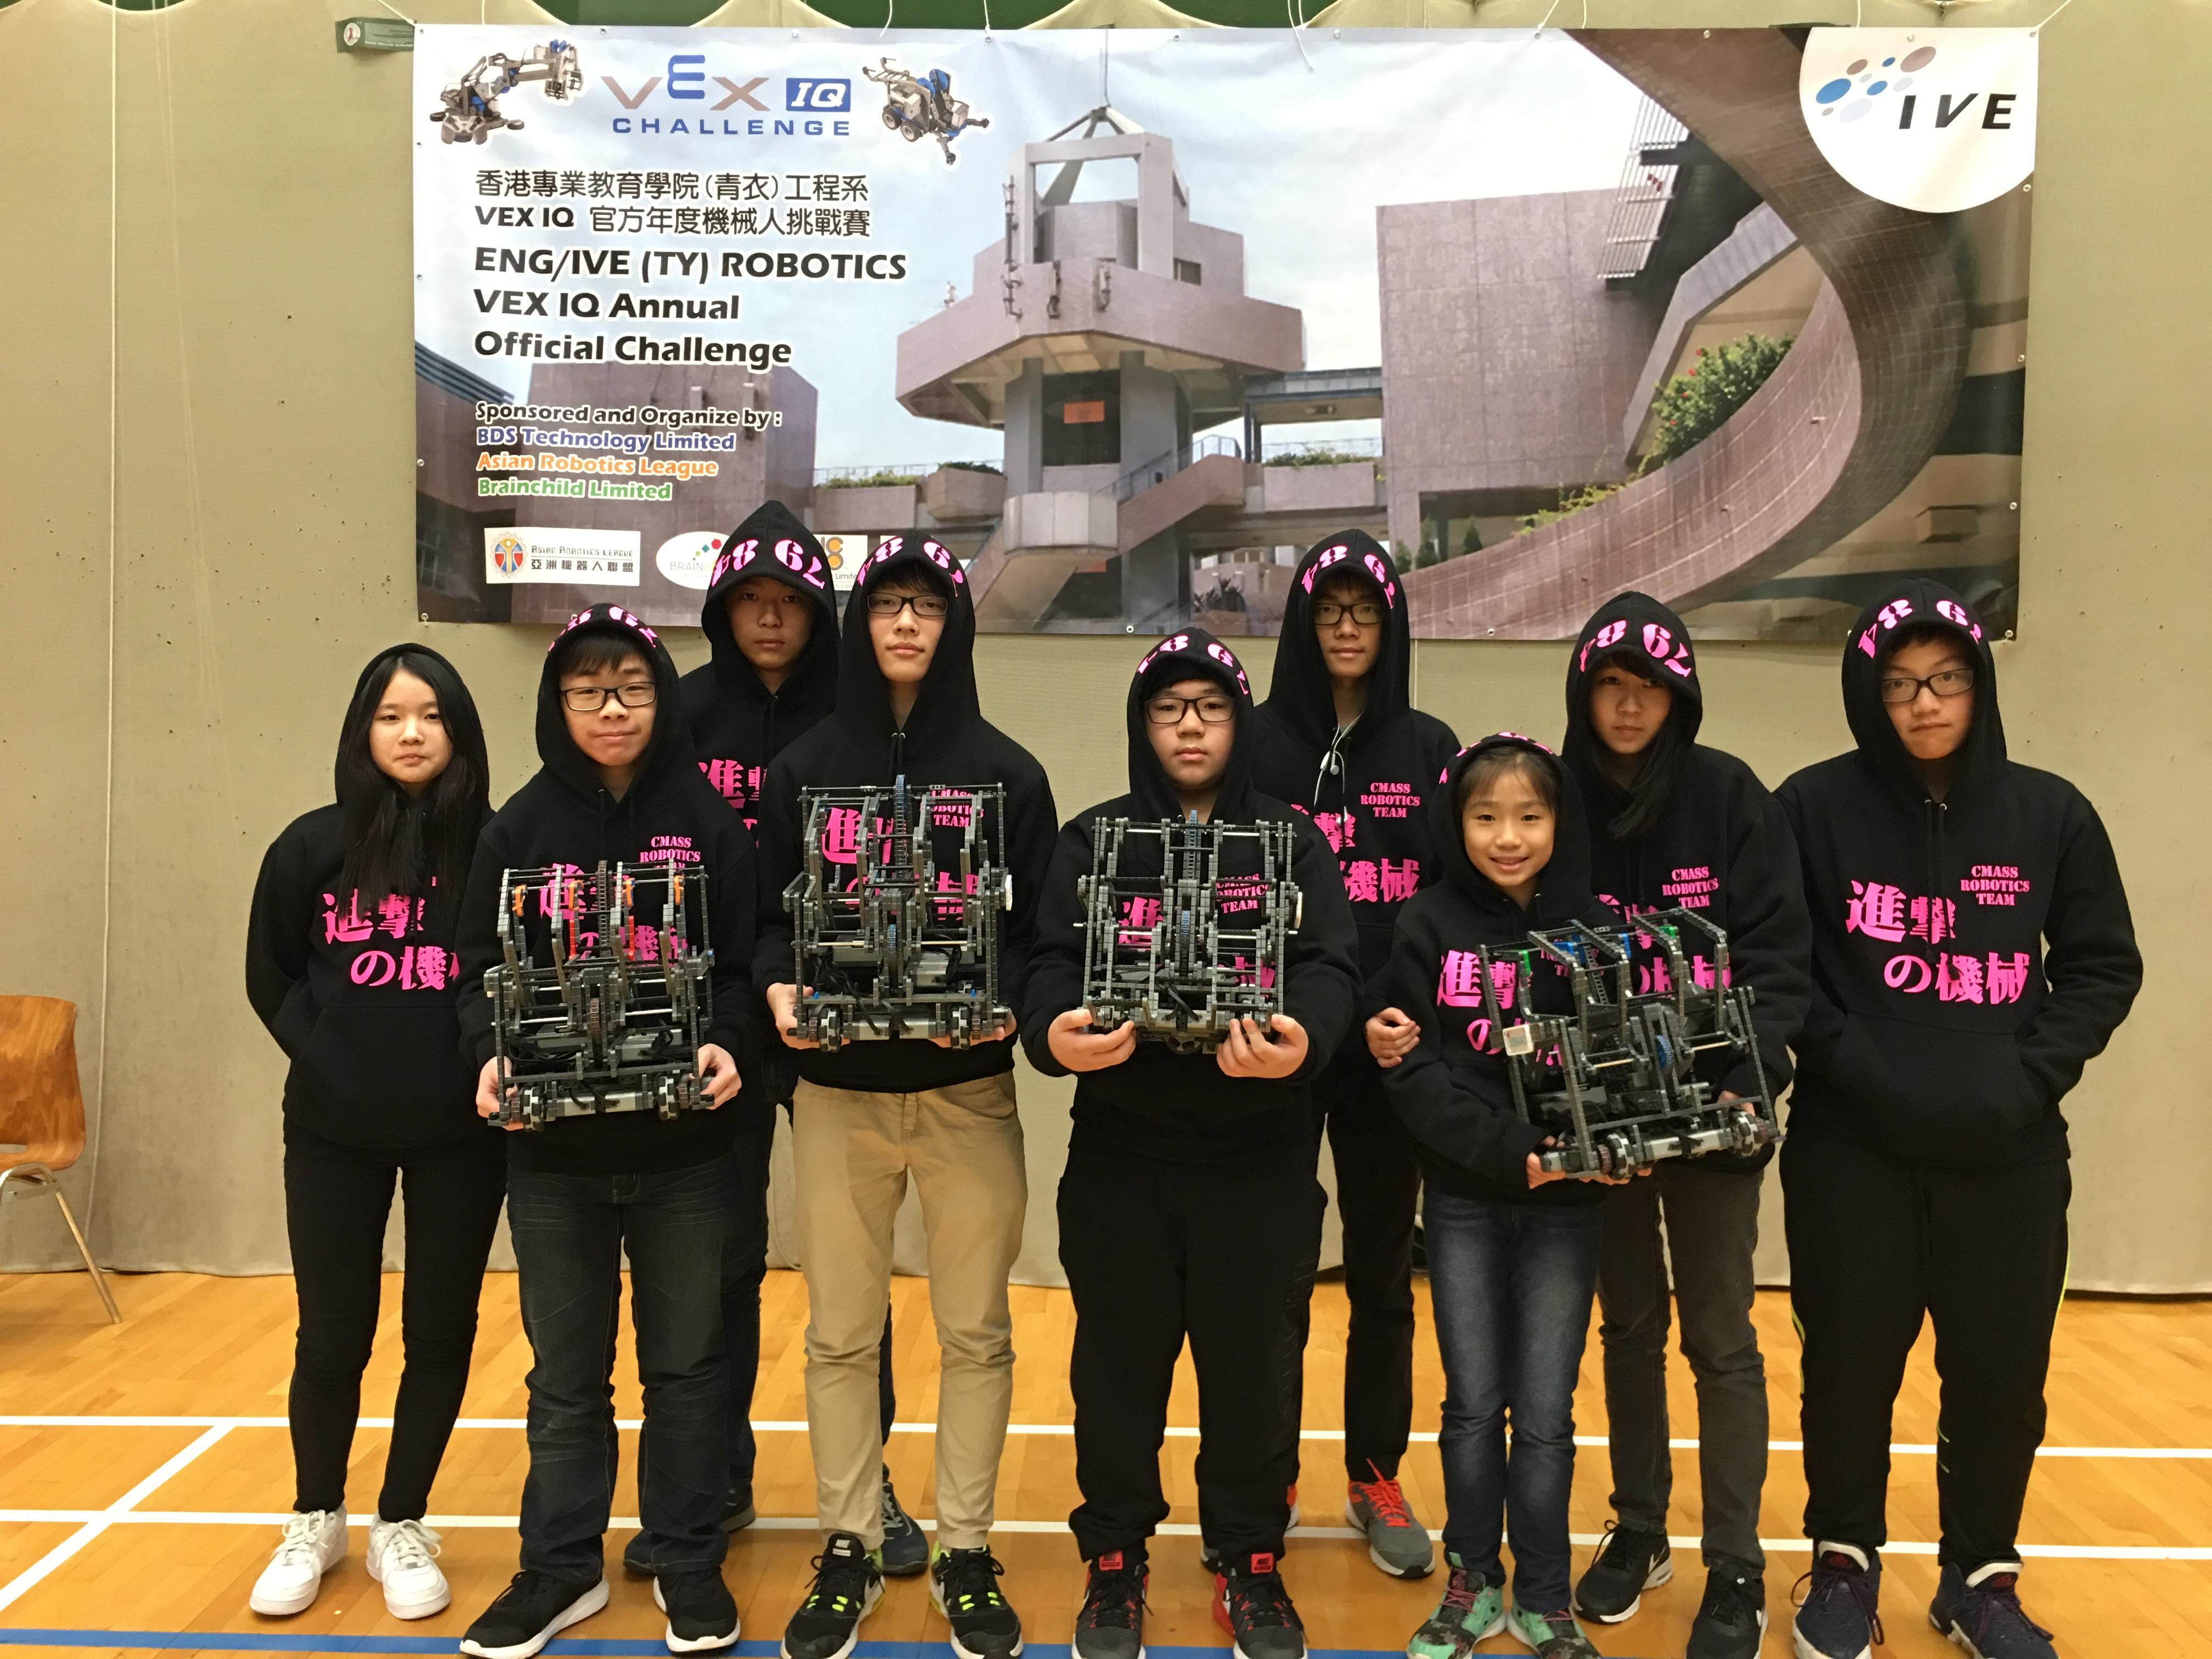 VEX IQ Challenge 2017 Hong Kong